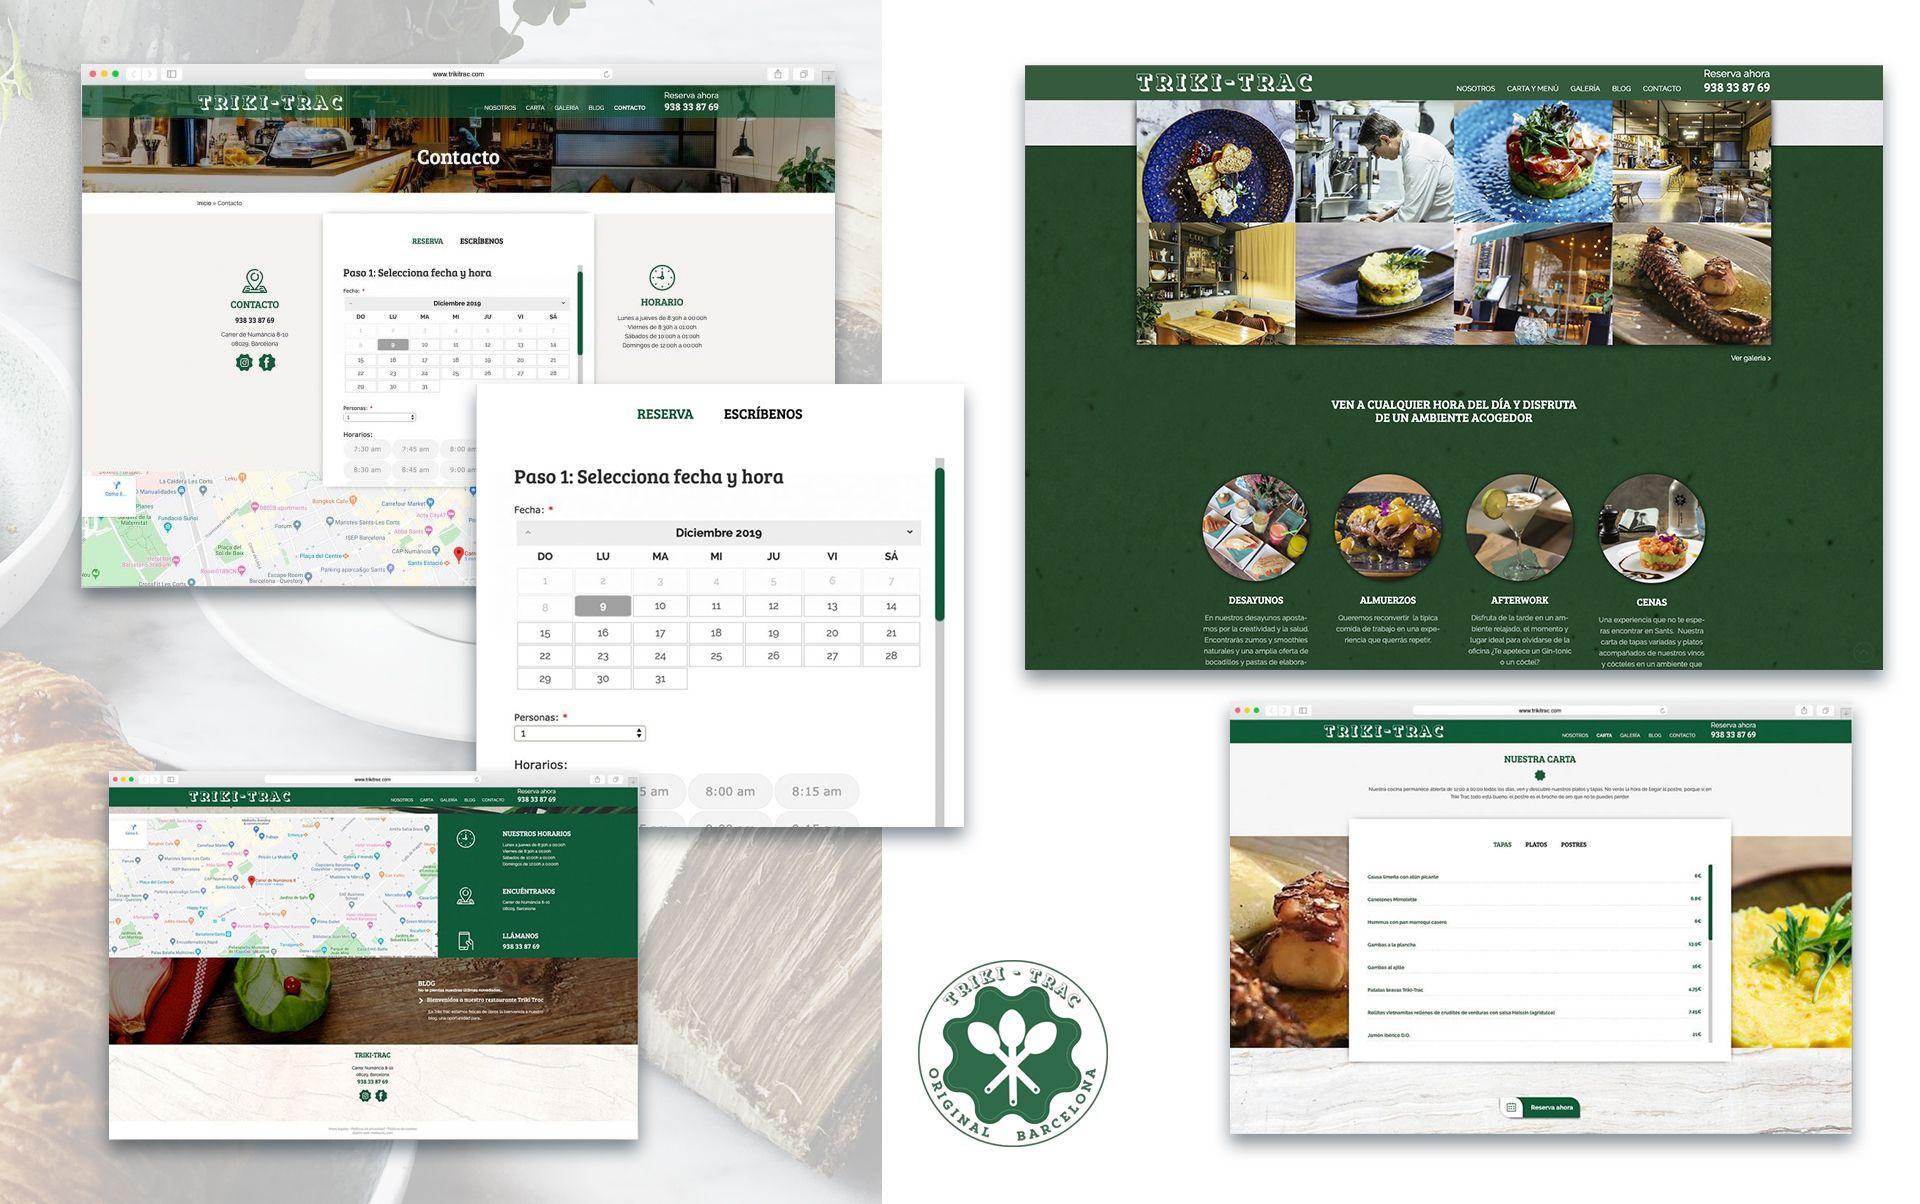 diseno web profesional para restaurante - Diseño web restaurante de Barcelona